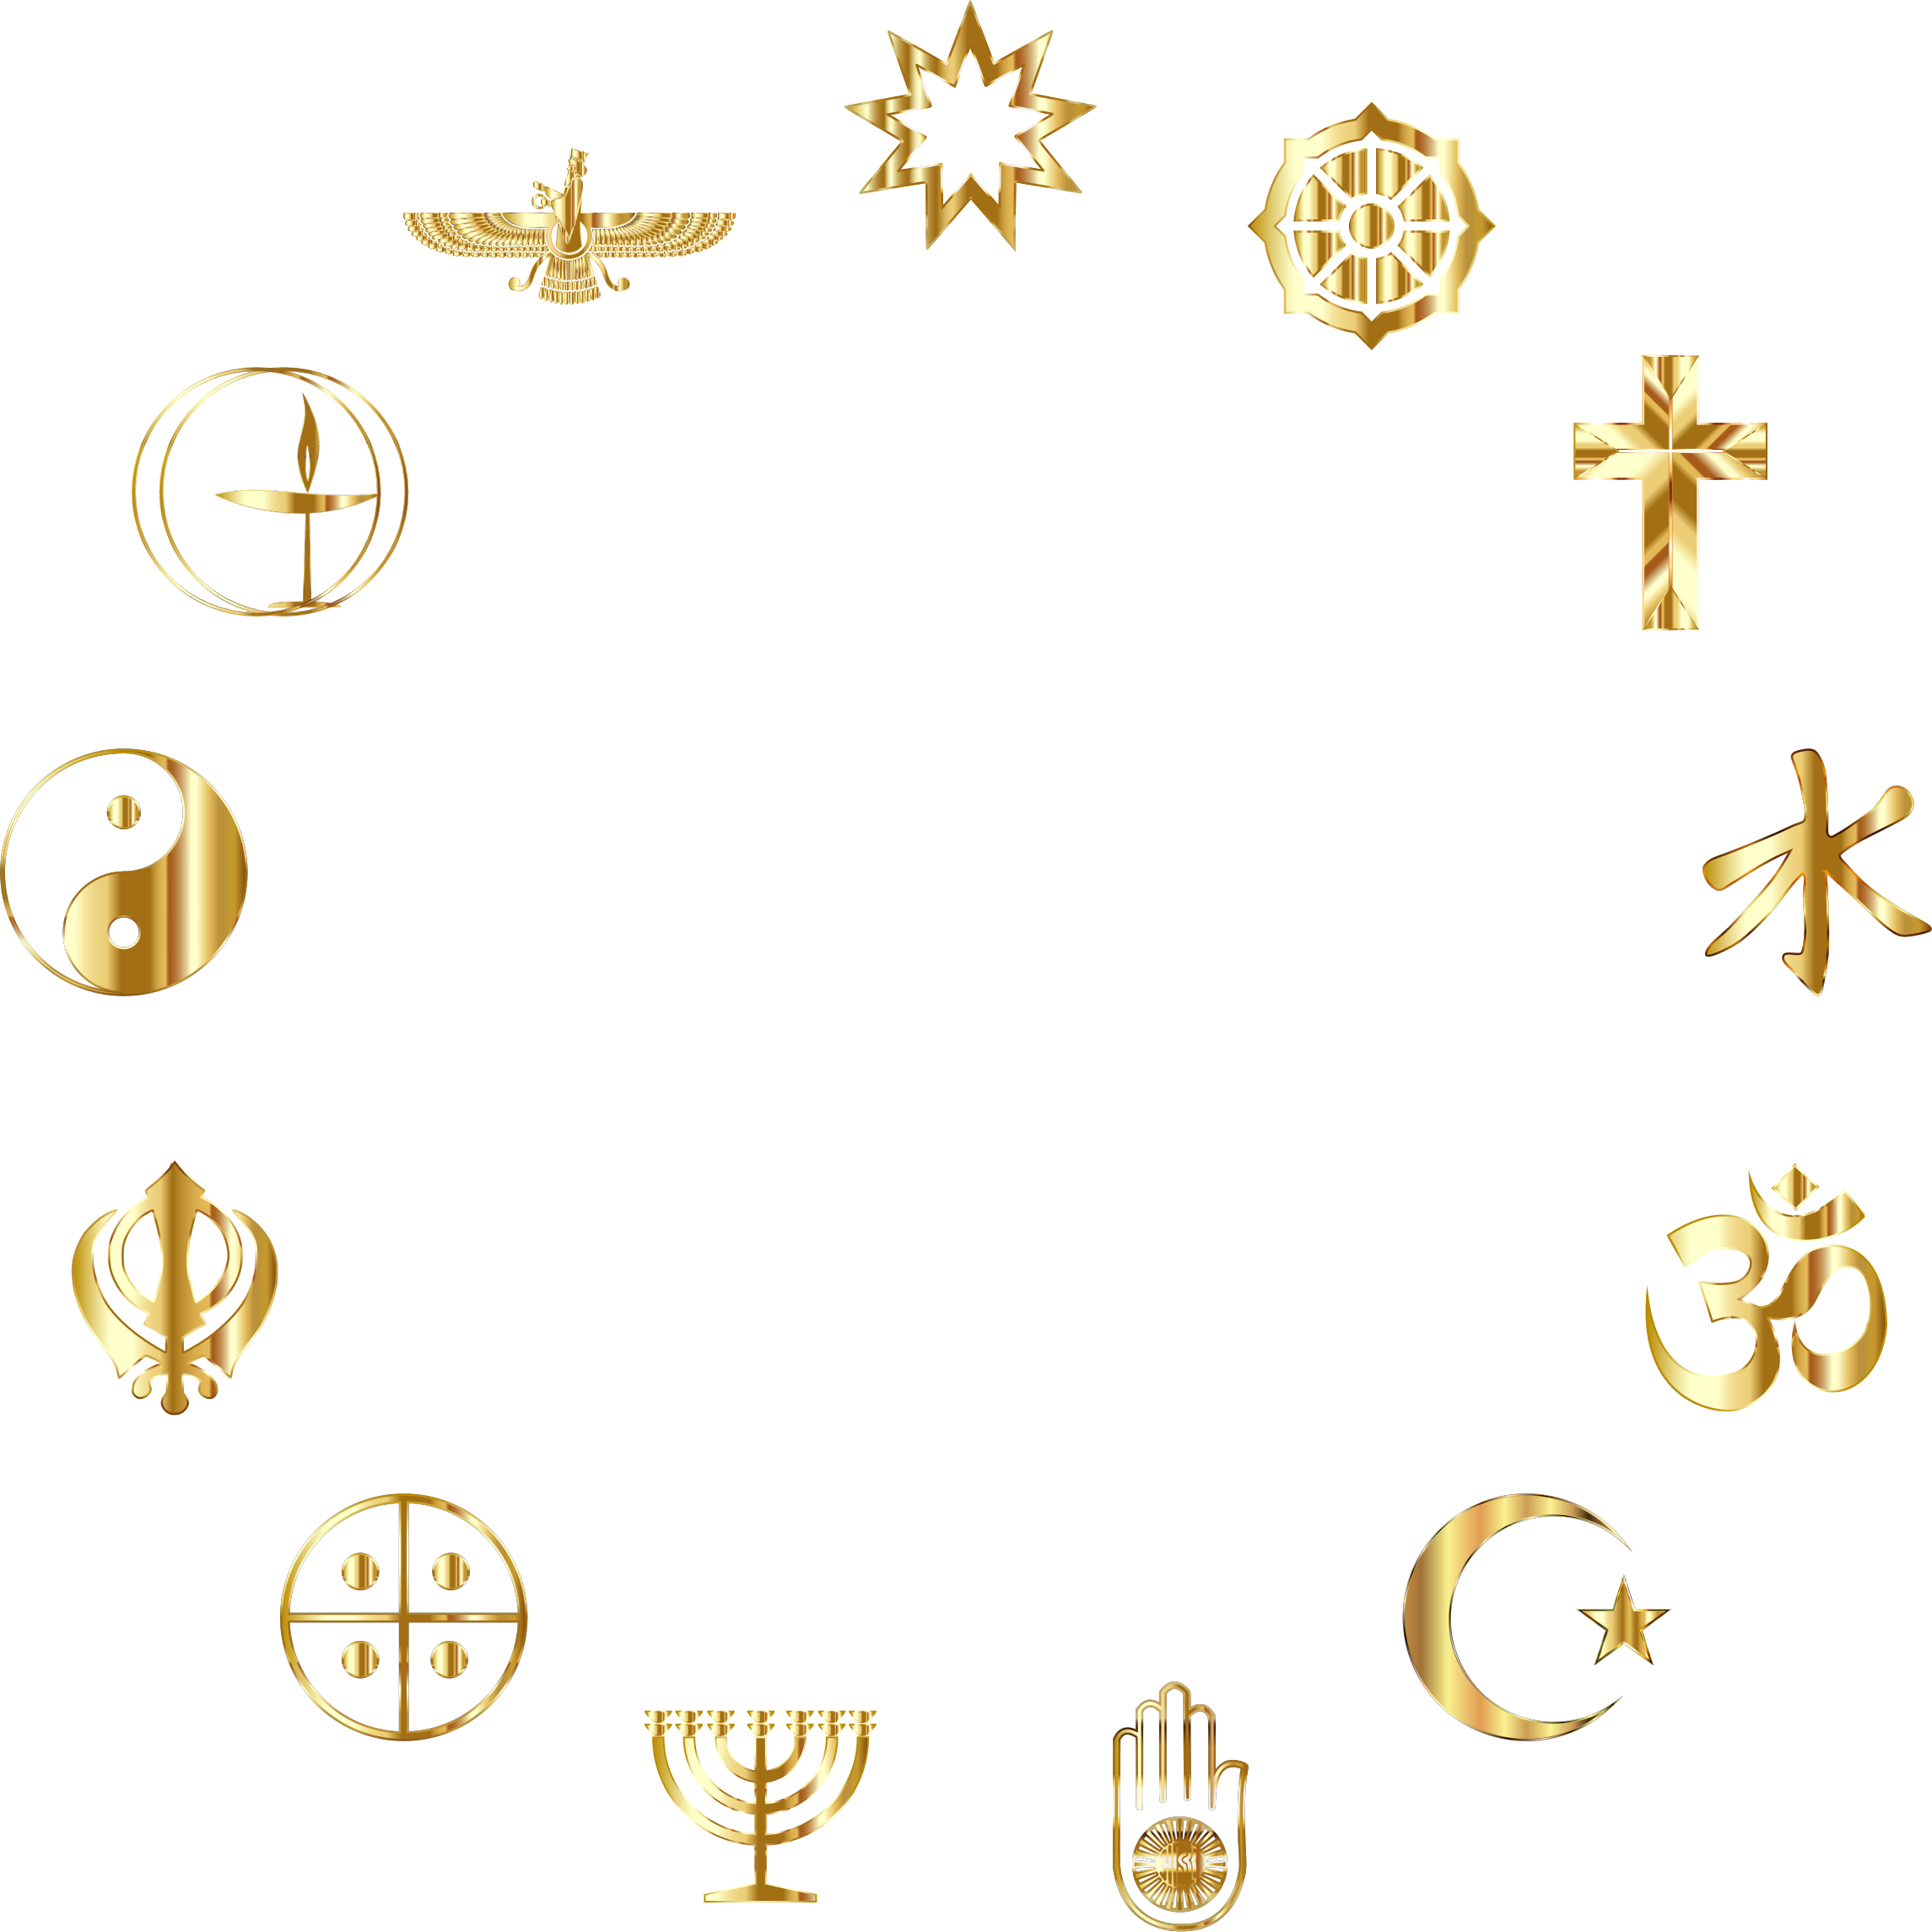 Clipart world world religion. Religious symbols gold big